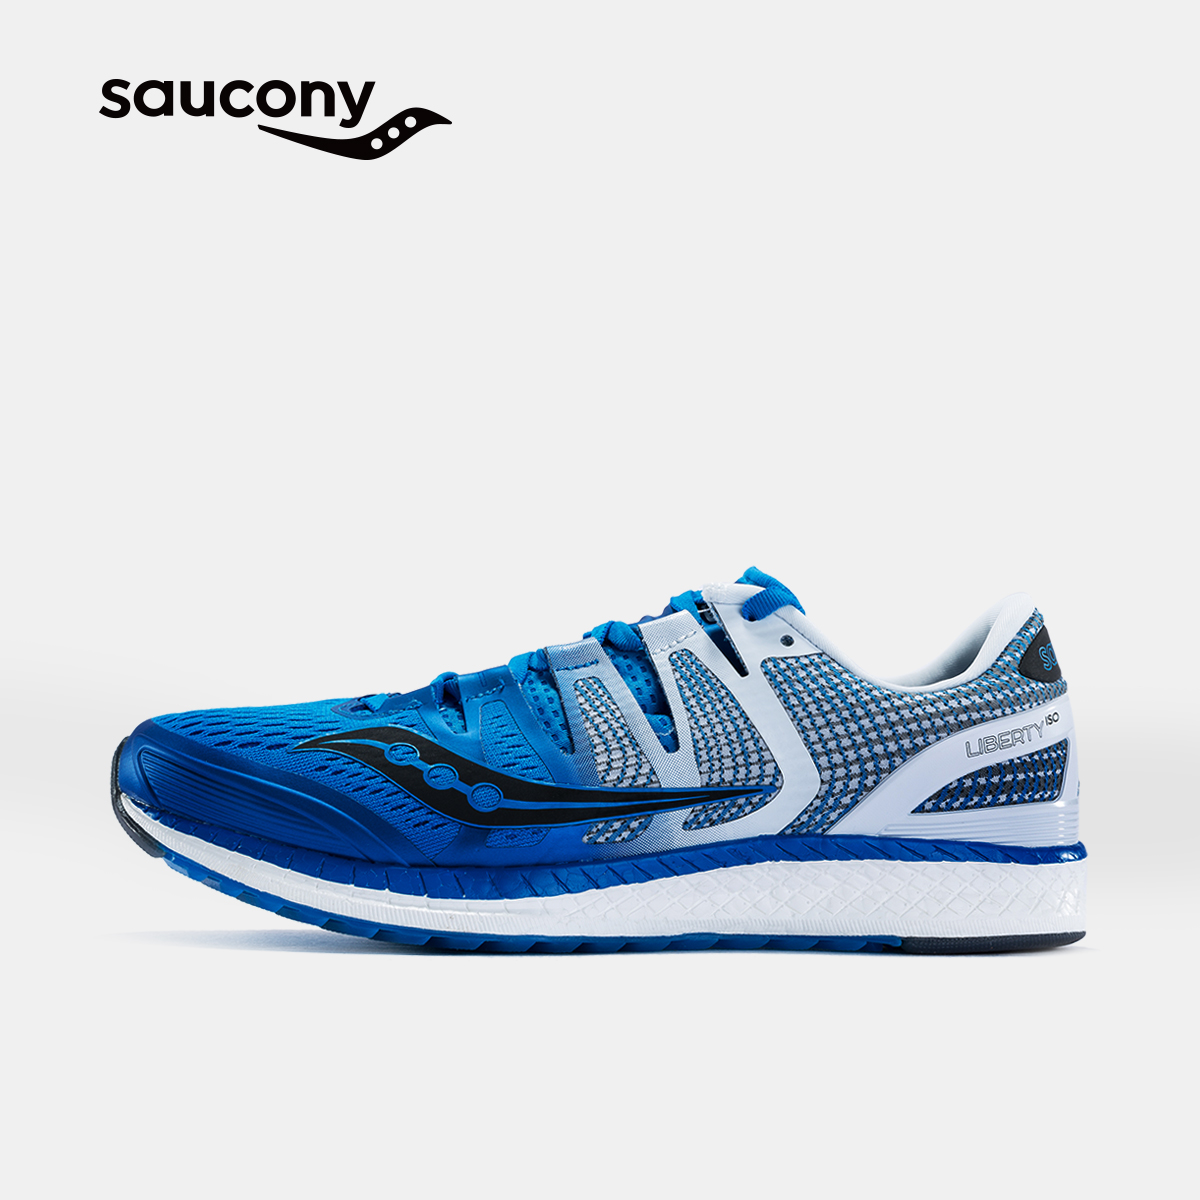 Saucony圣康尼LIBERTY ISO 稳定保护跑鞋运动鞋男子跑步鞋S20410